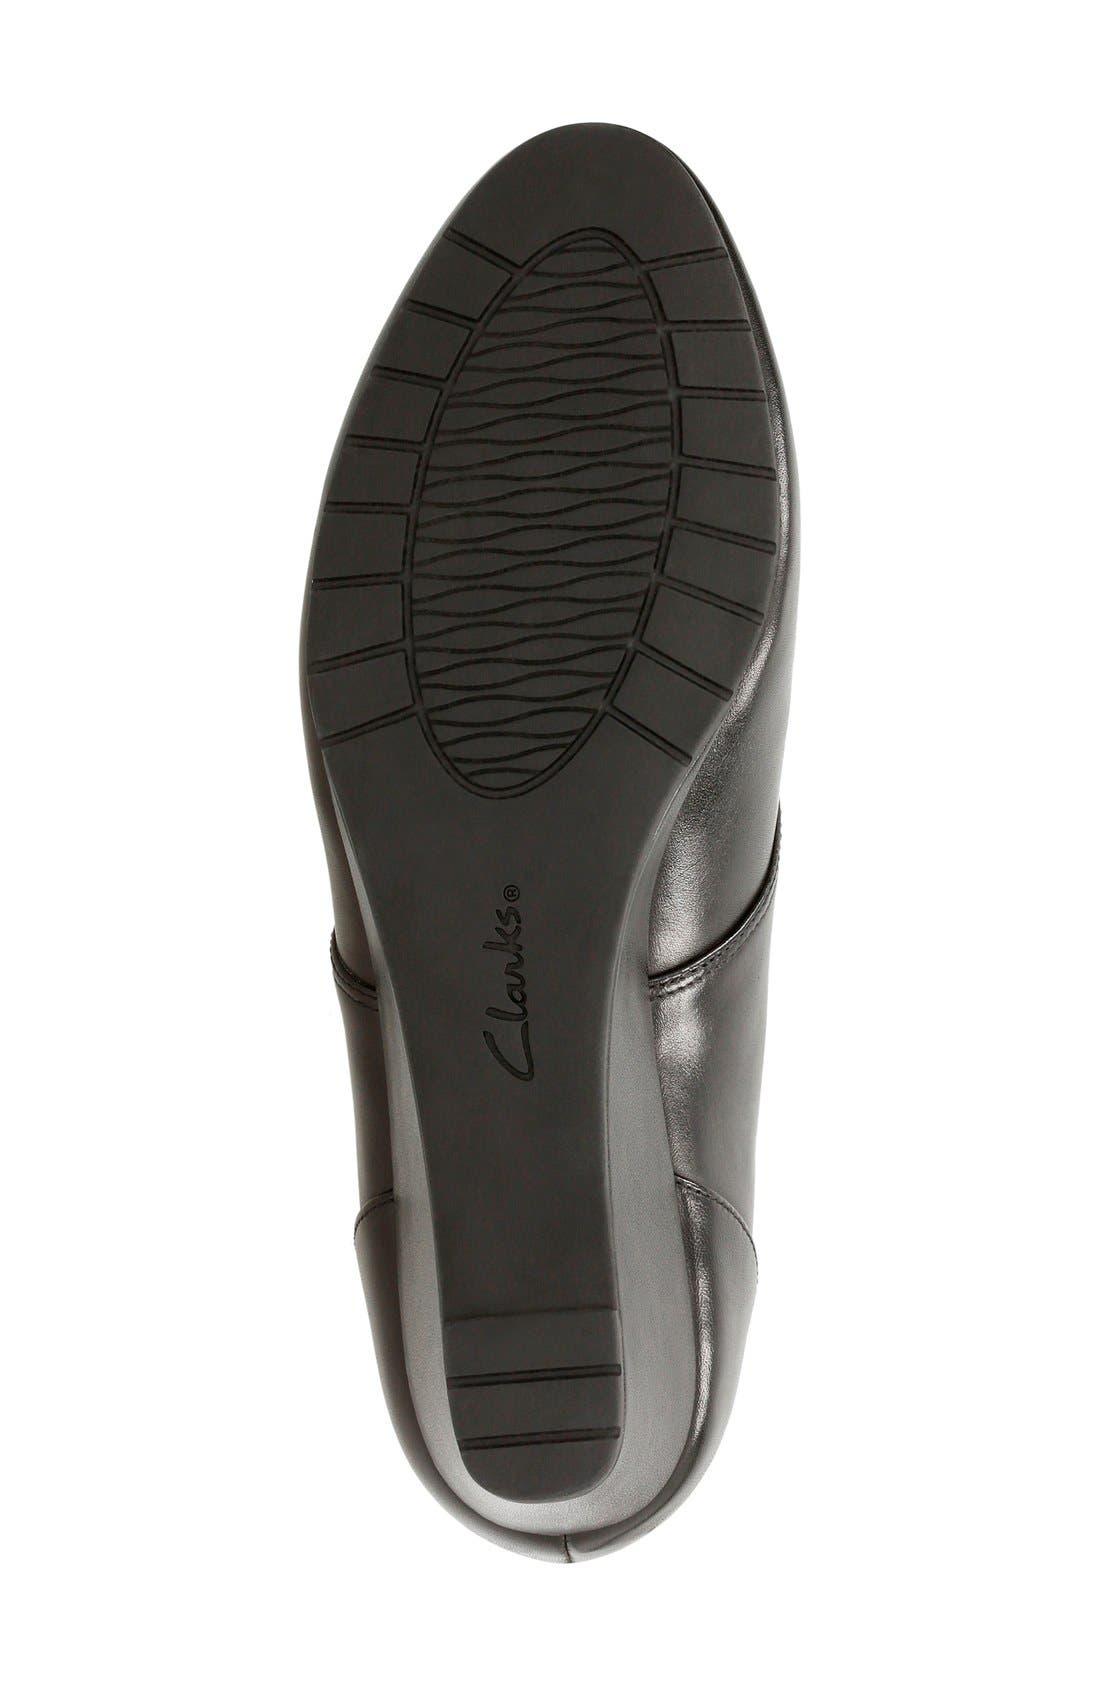 'Vendra Peak' Wedge Boot,                             Alternate thumbnail 4, color,                             Black Leather